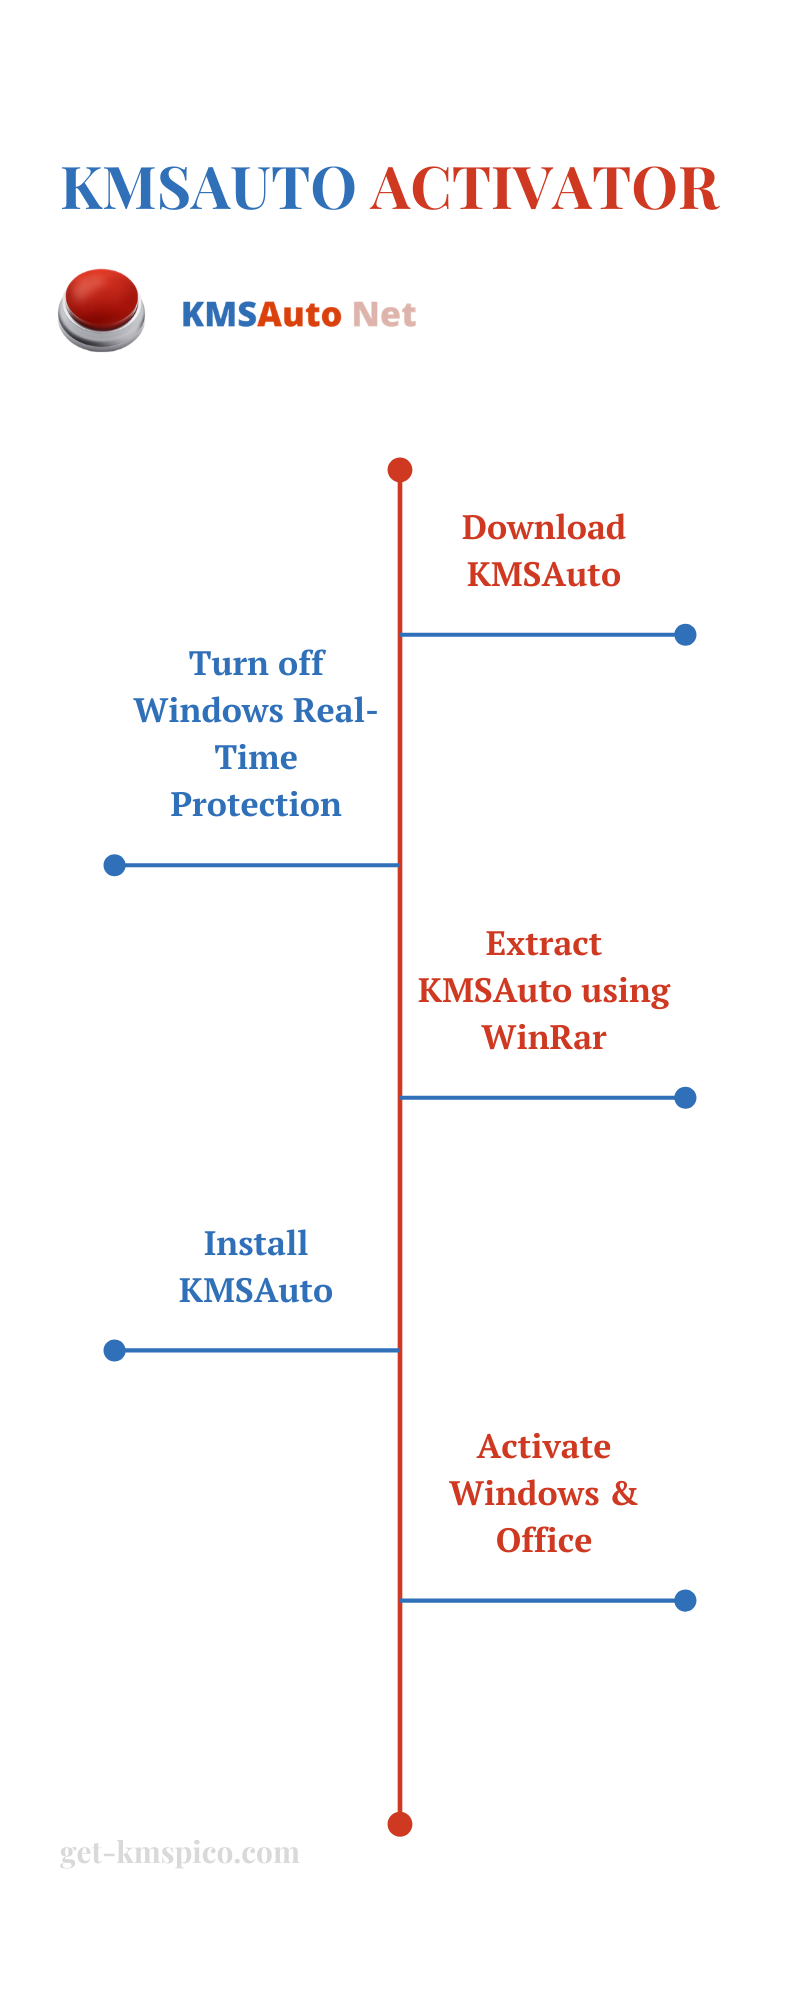 KMSAuto-Infographic